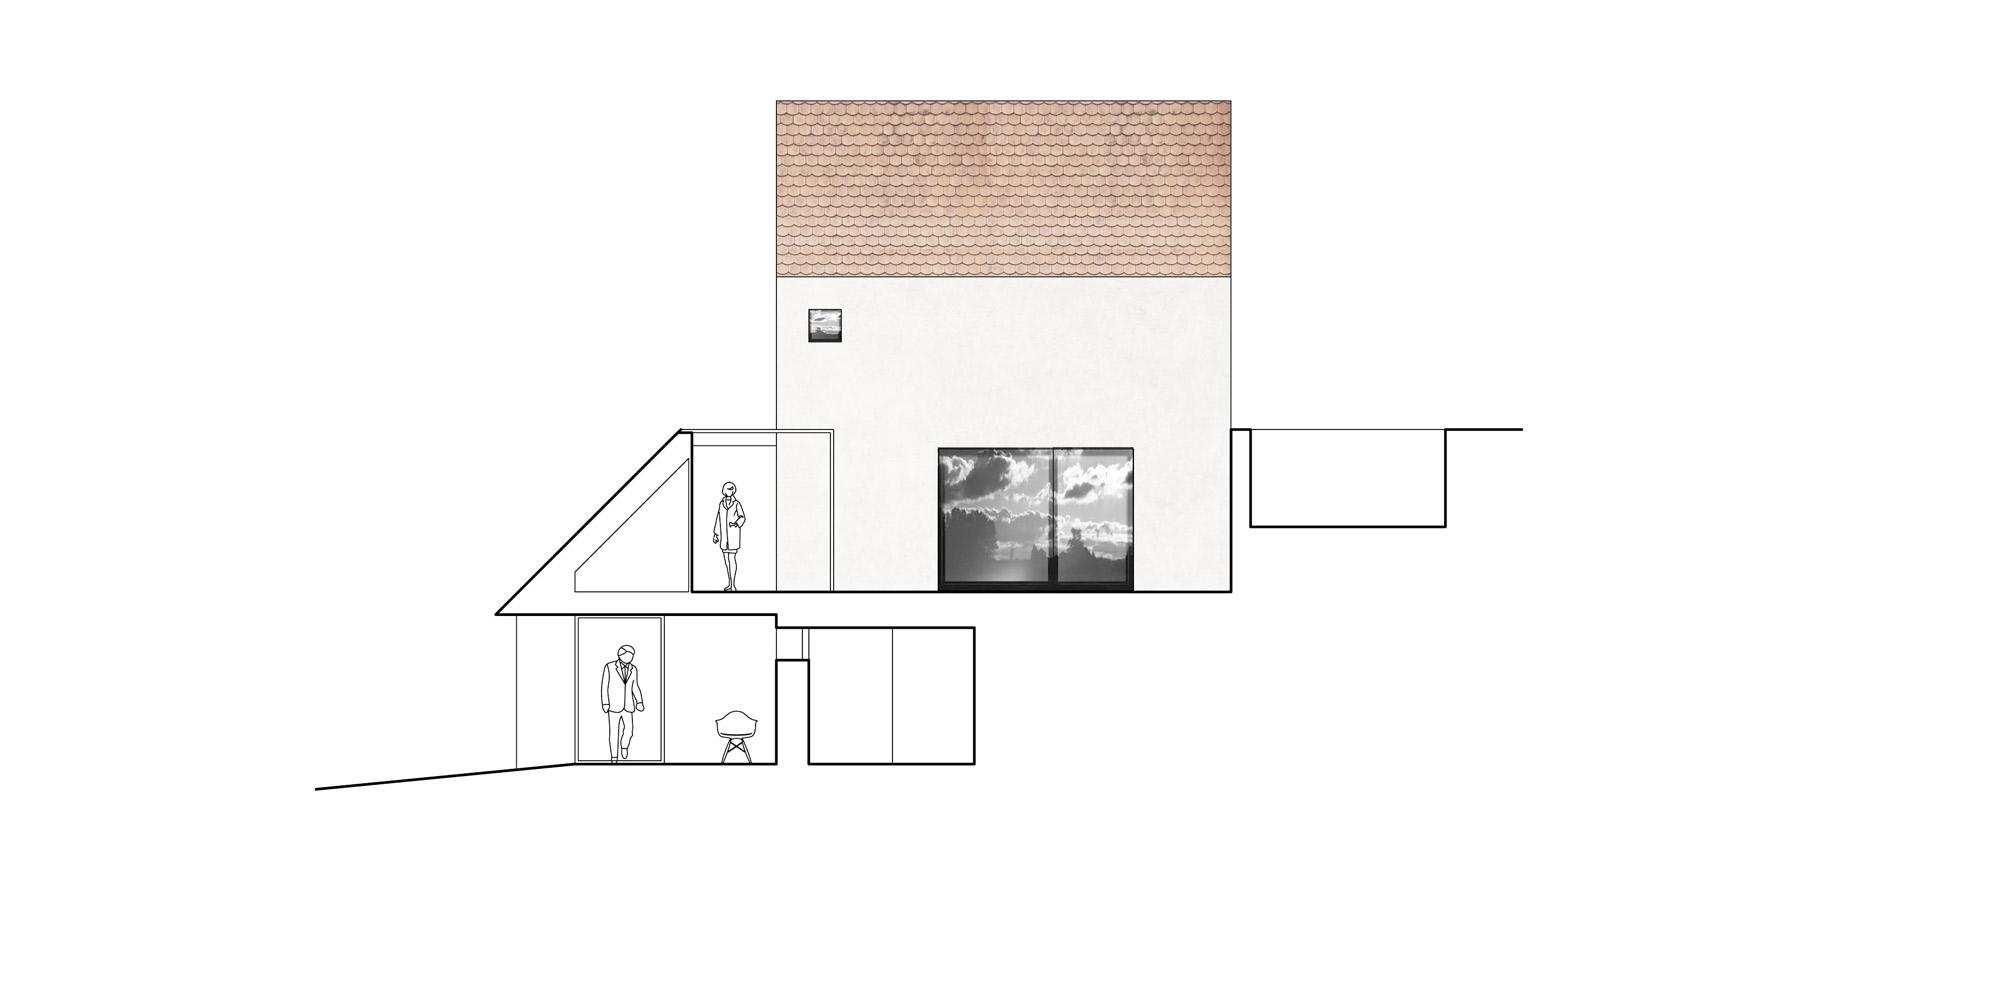 Sezione CC © Atelier 111 architekti